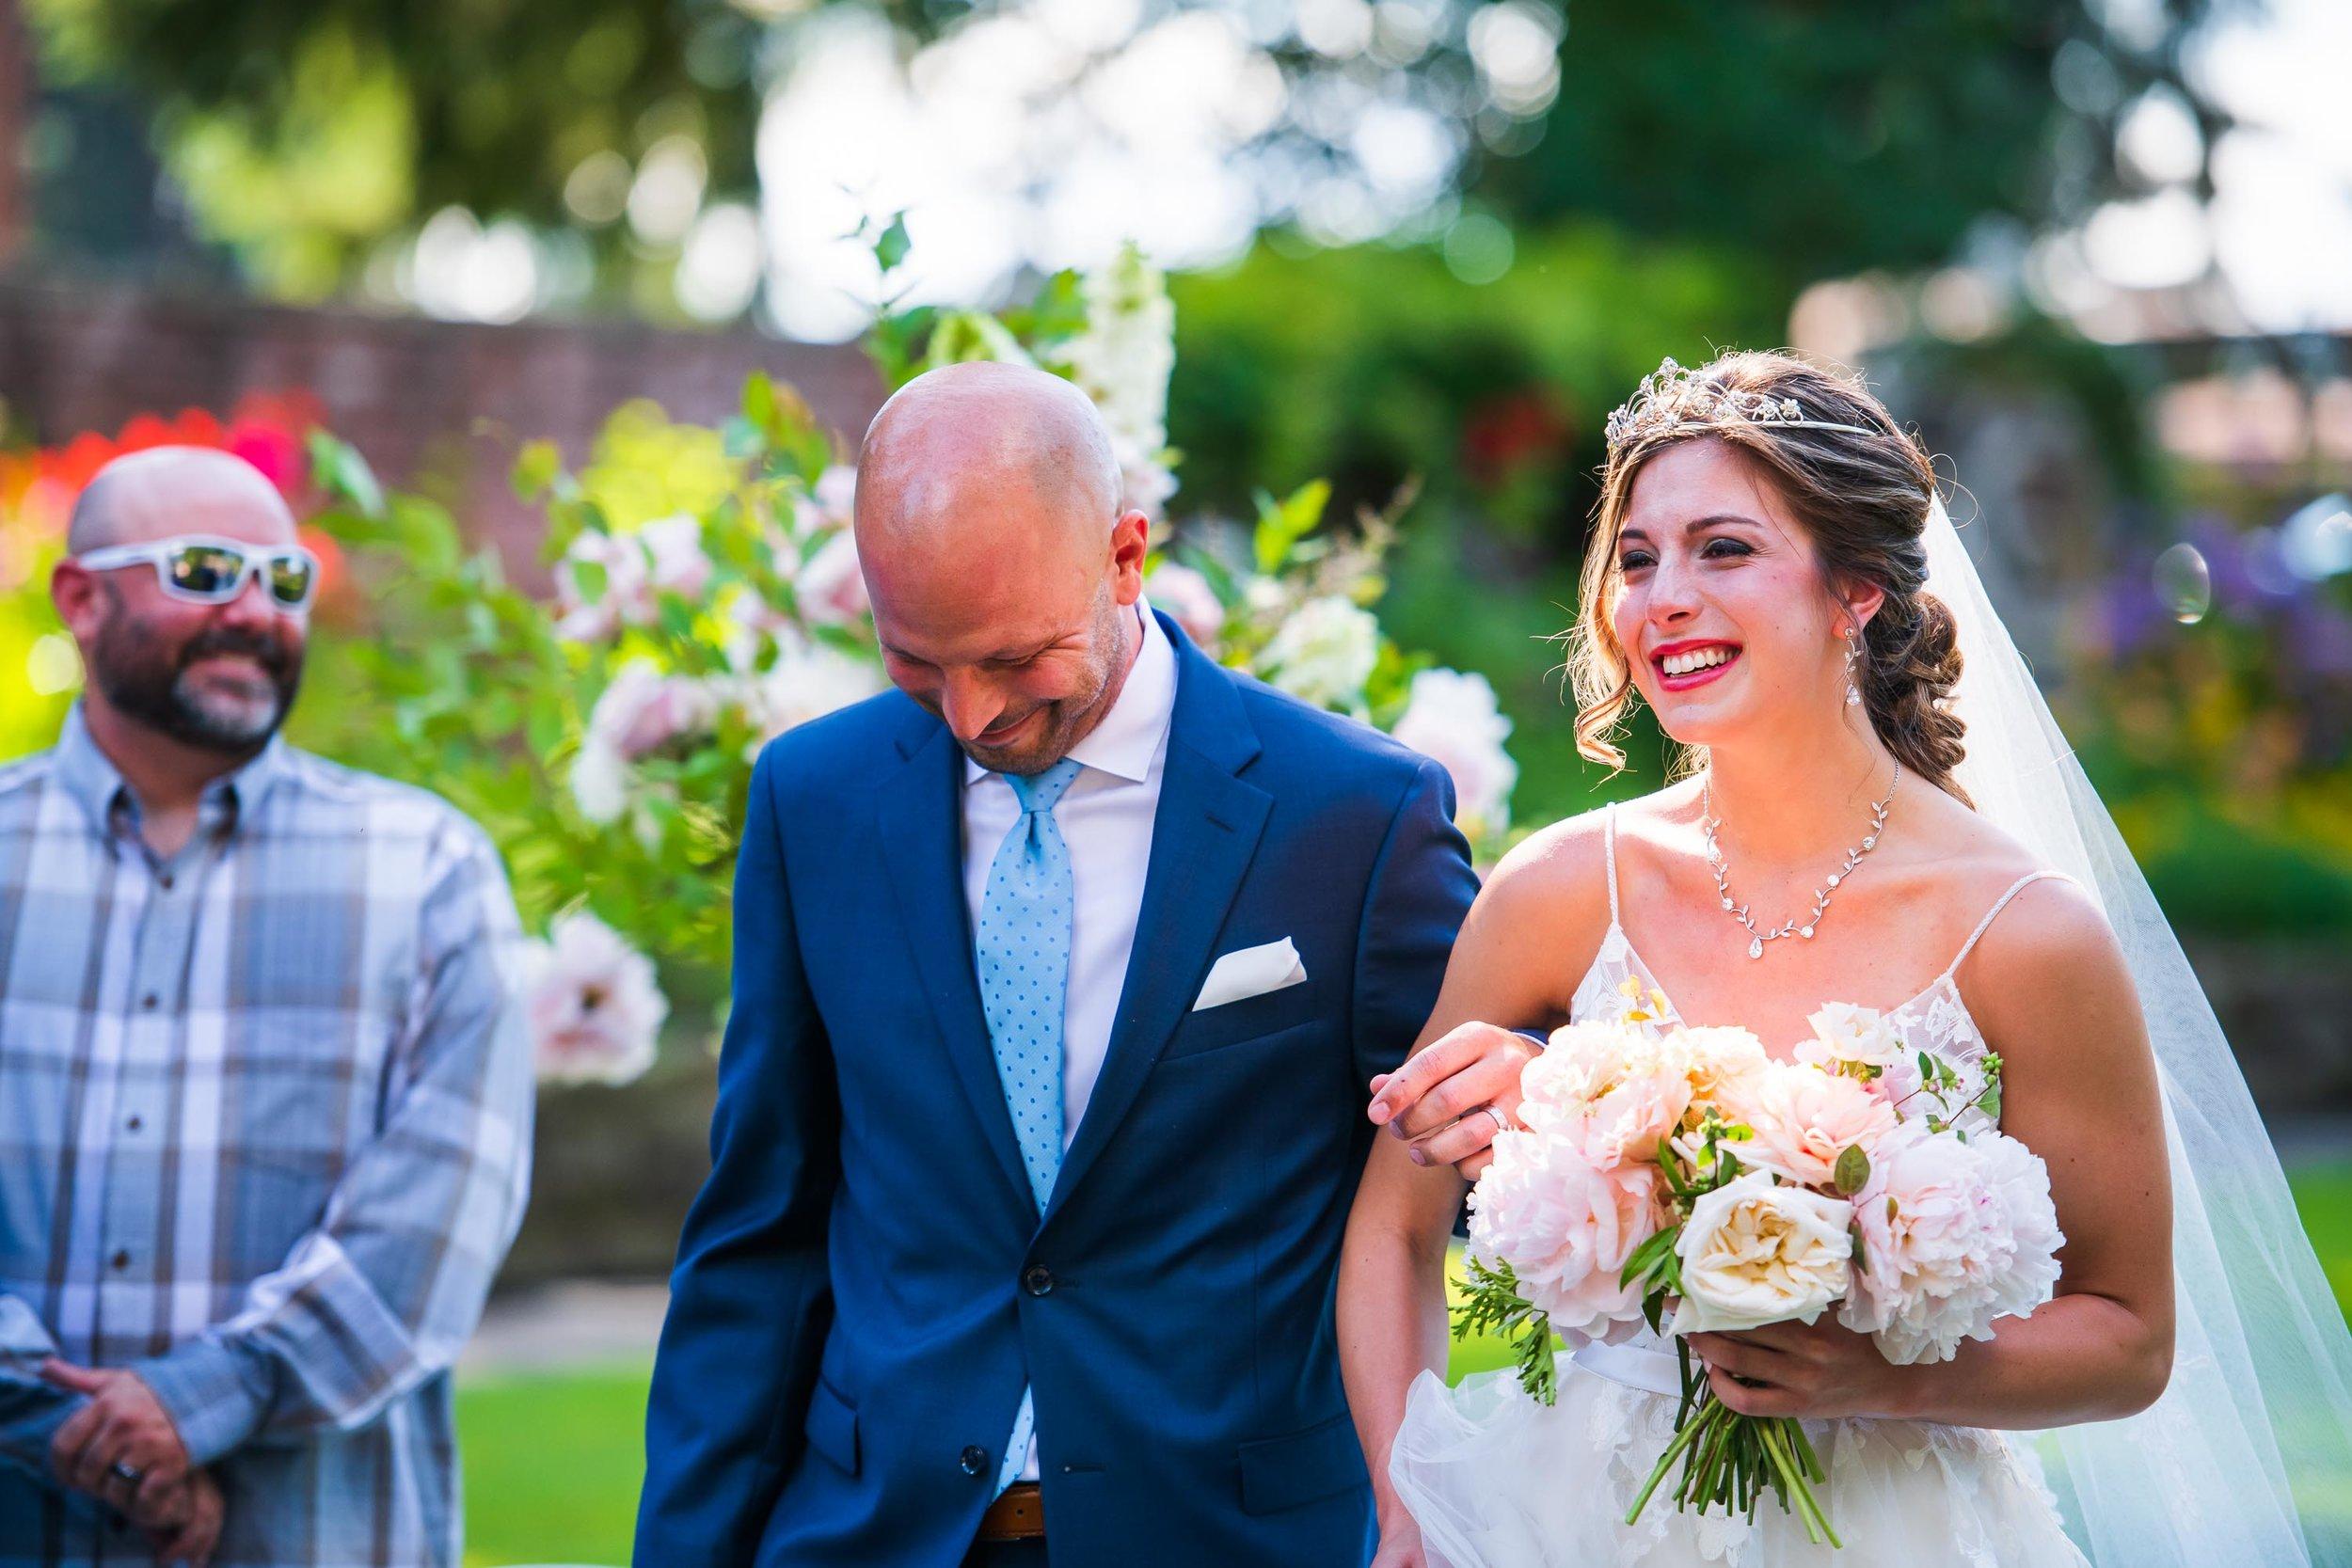 thornewood castle wedding 47.jpg